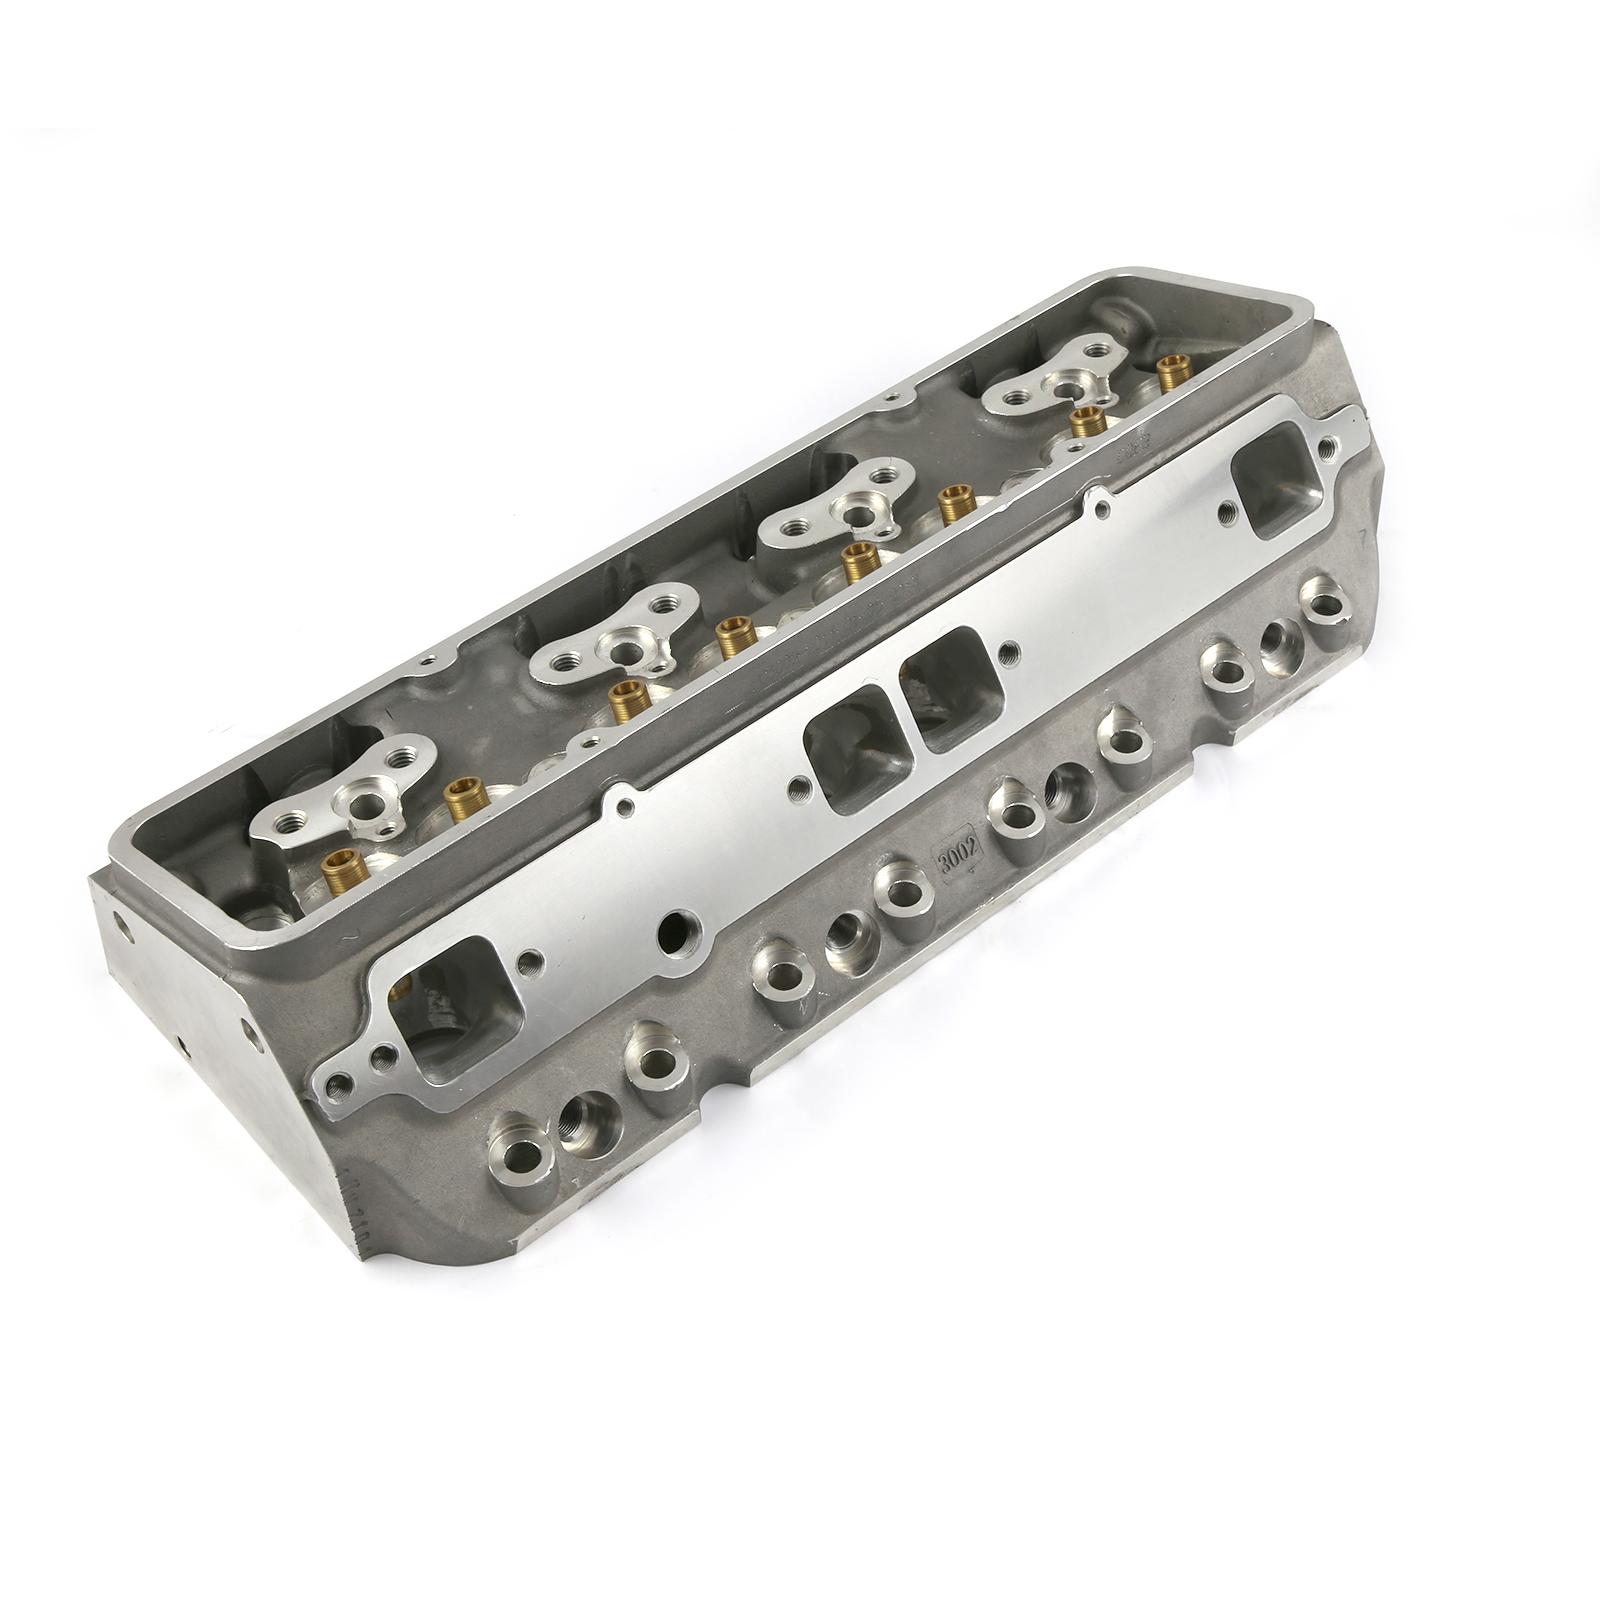 Chevy SBC 350 215cc 68cc Angle Plug Full CNC Bare Aluminum Cylinder Head